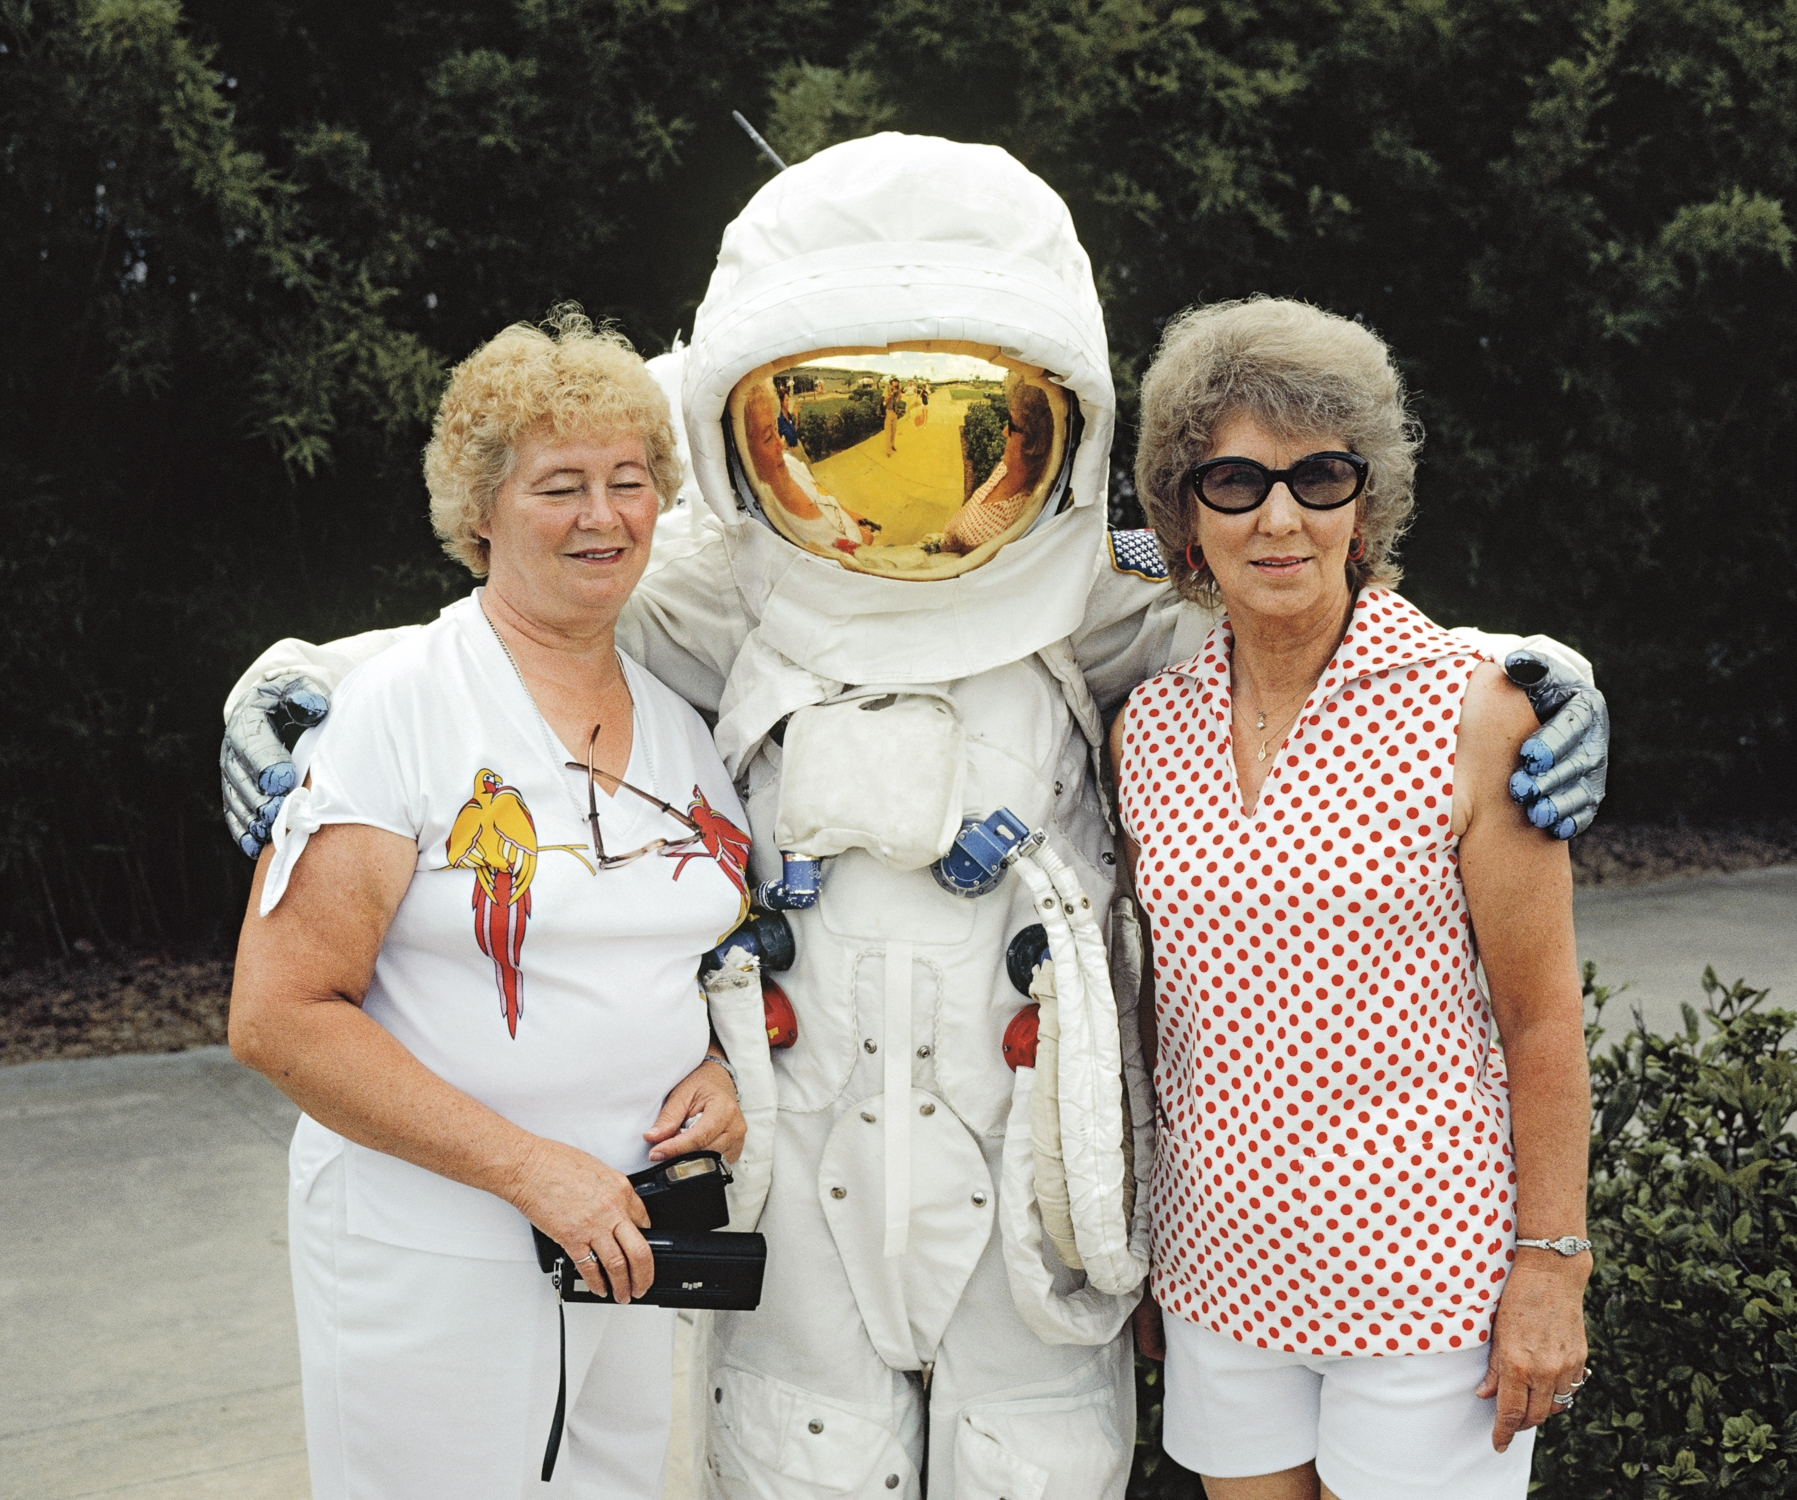 Tourists at Kennedy Space Center   Turistas en el Centro Espacial Kennedy